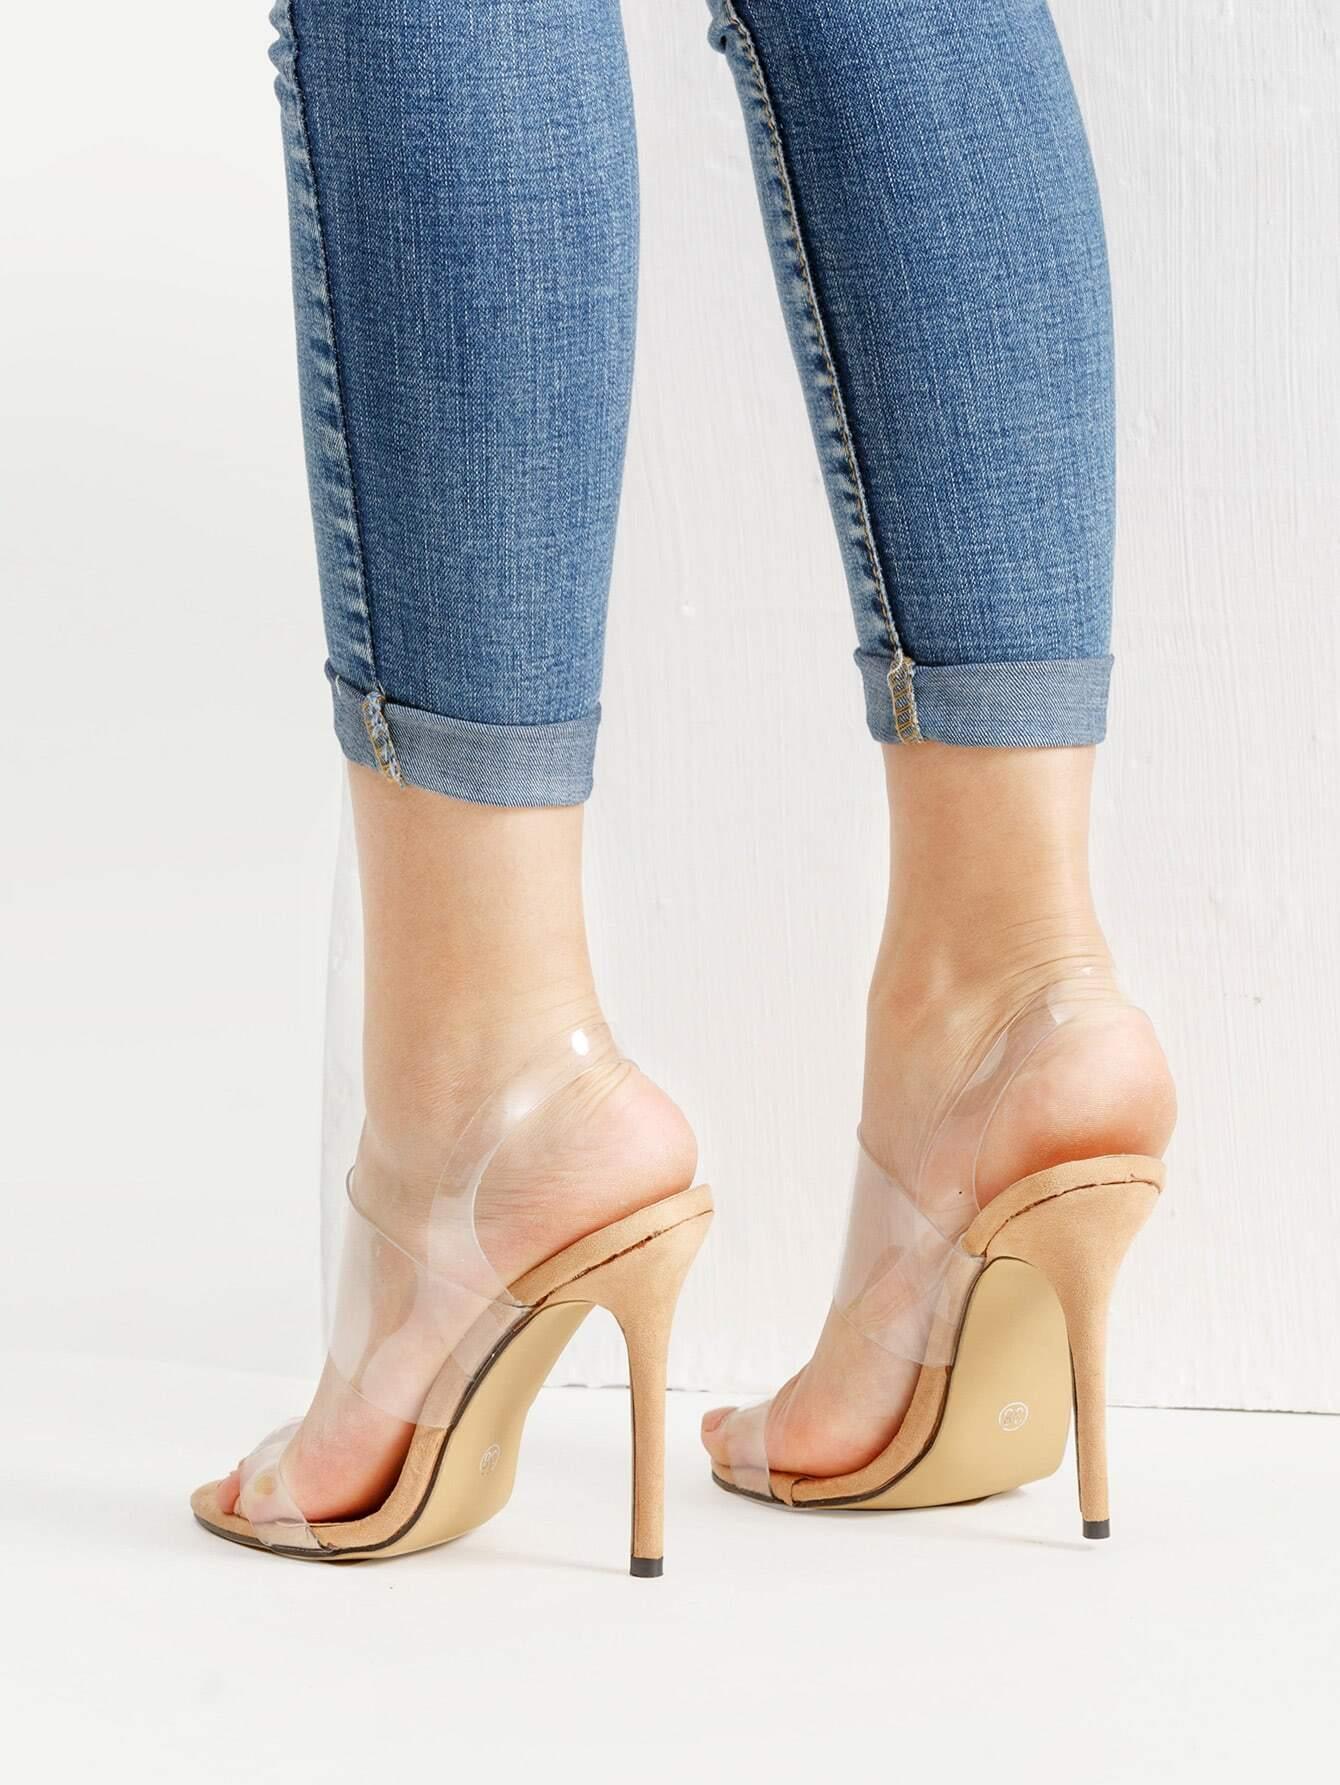 high heel shoe chair value city menards porch chairs clear strap stiletto sandals shein sheinside